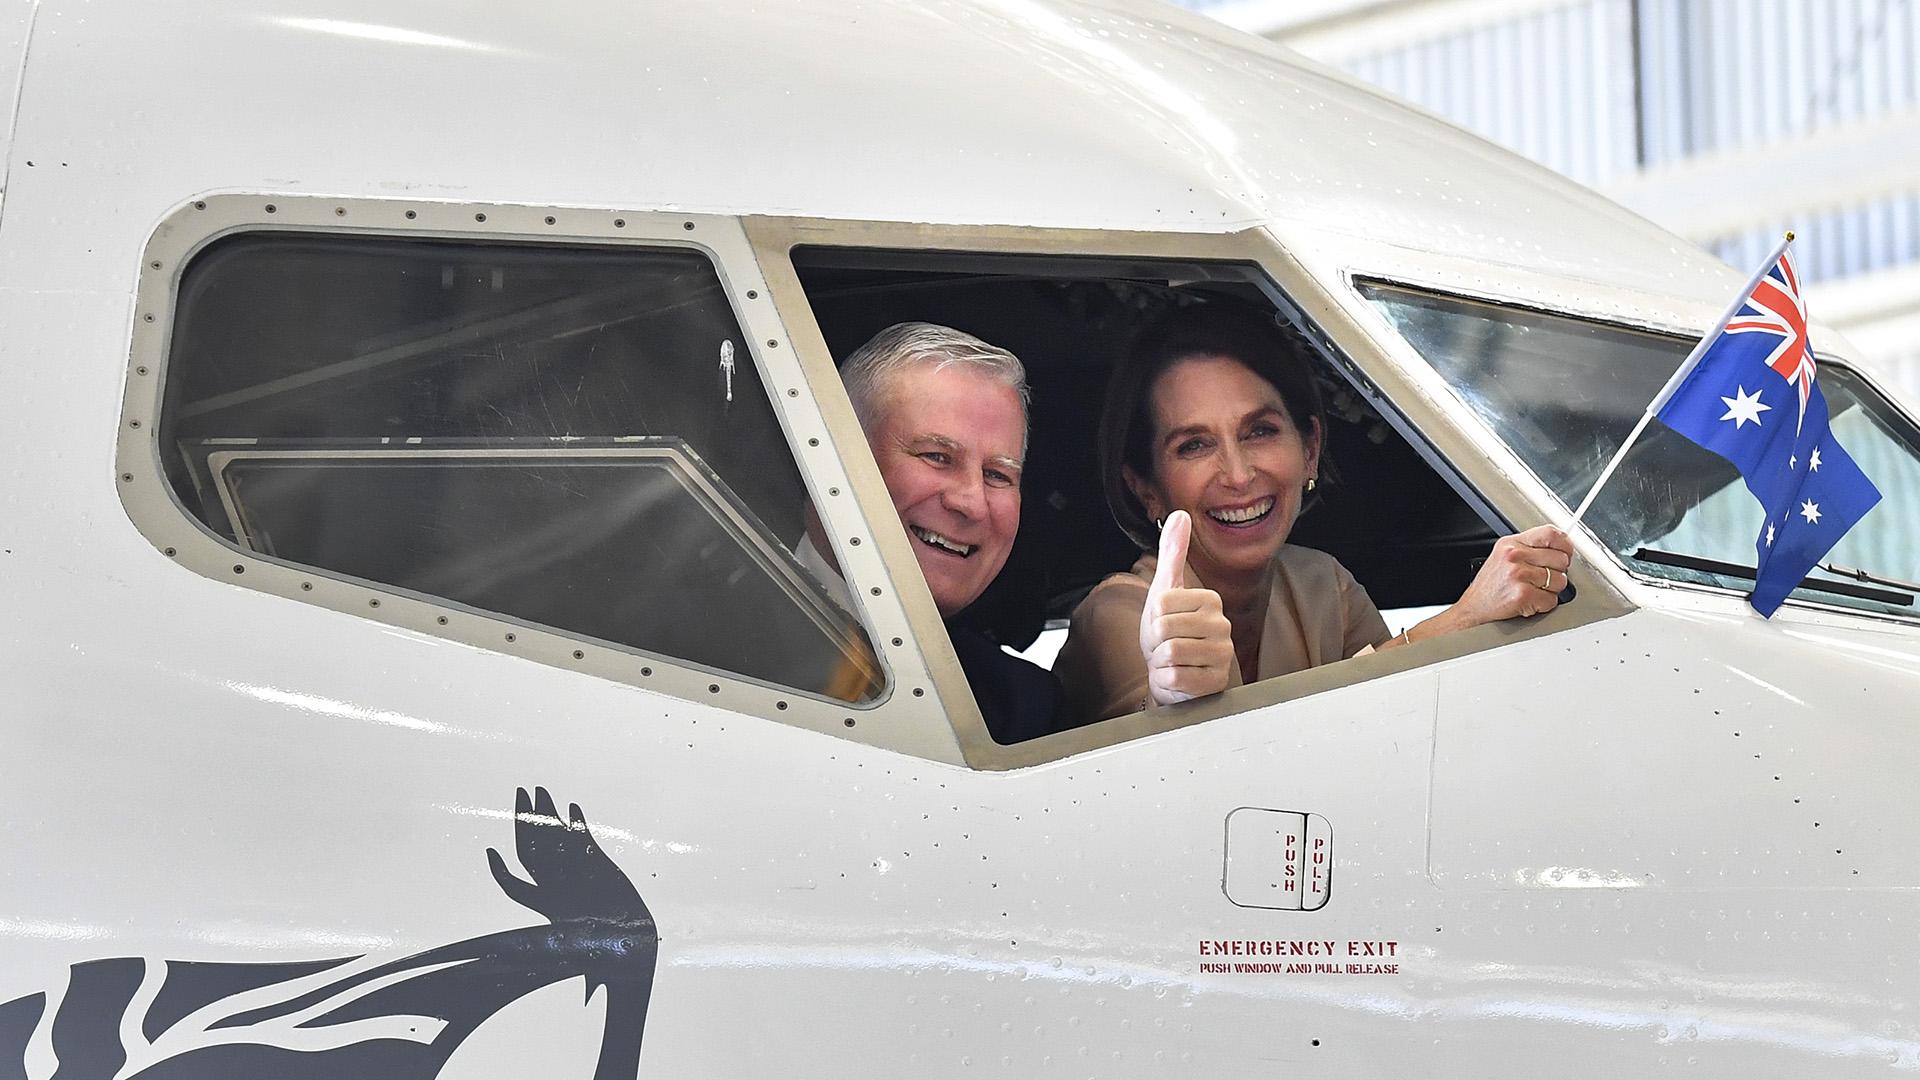 Virgin Australia Expands Flights After Covid Blow